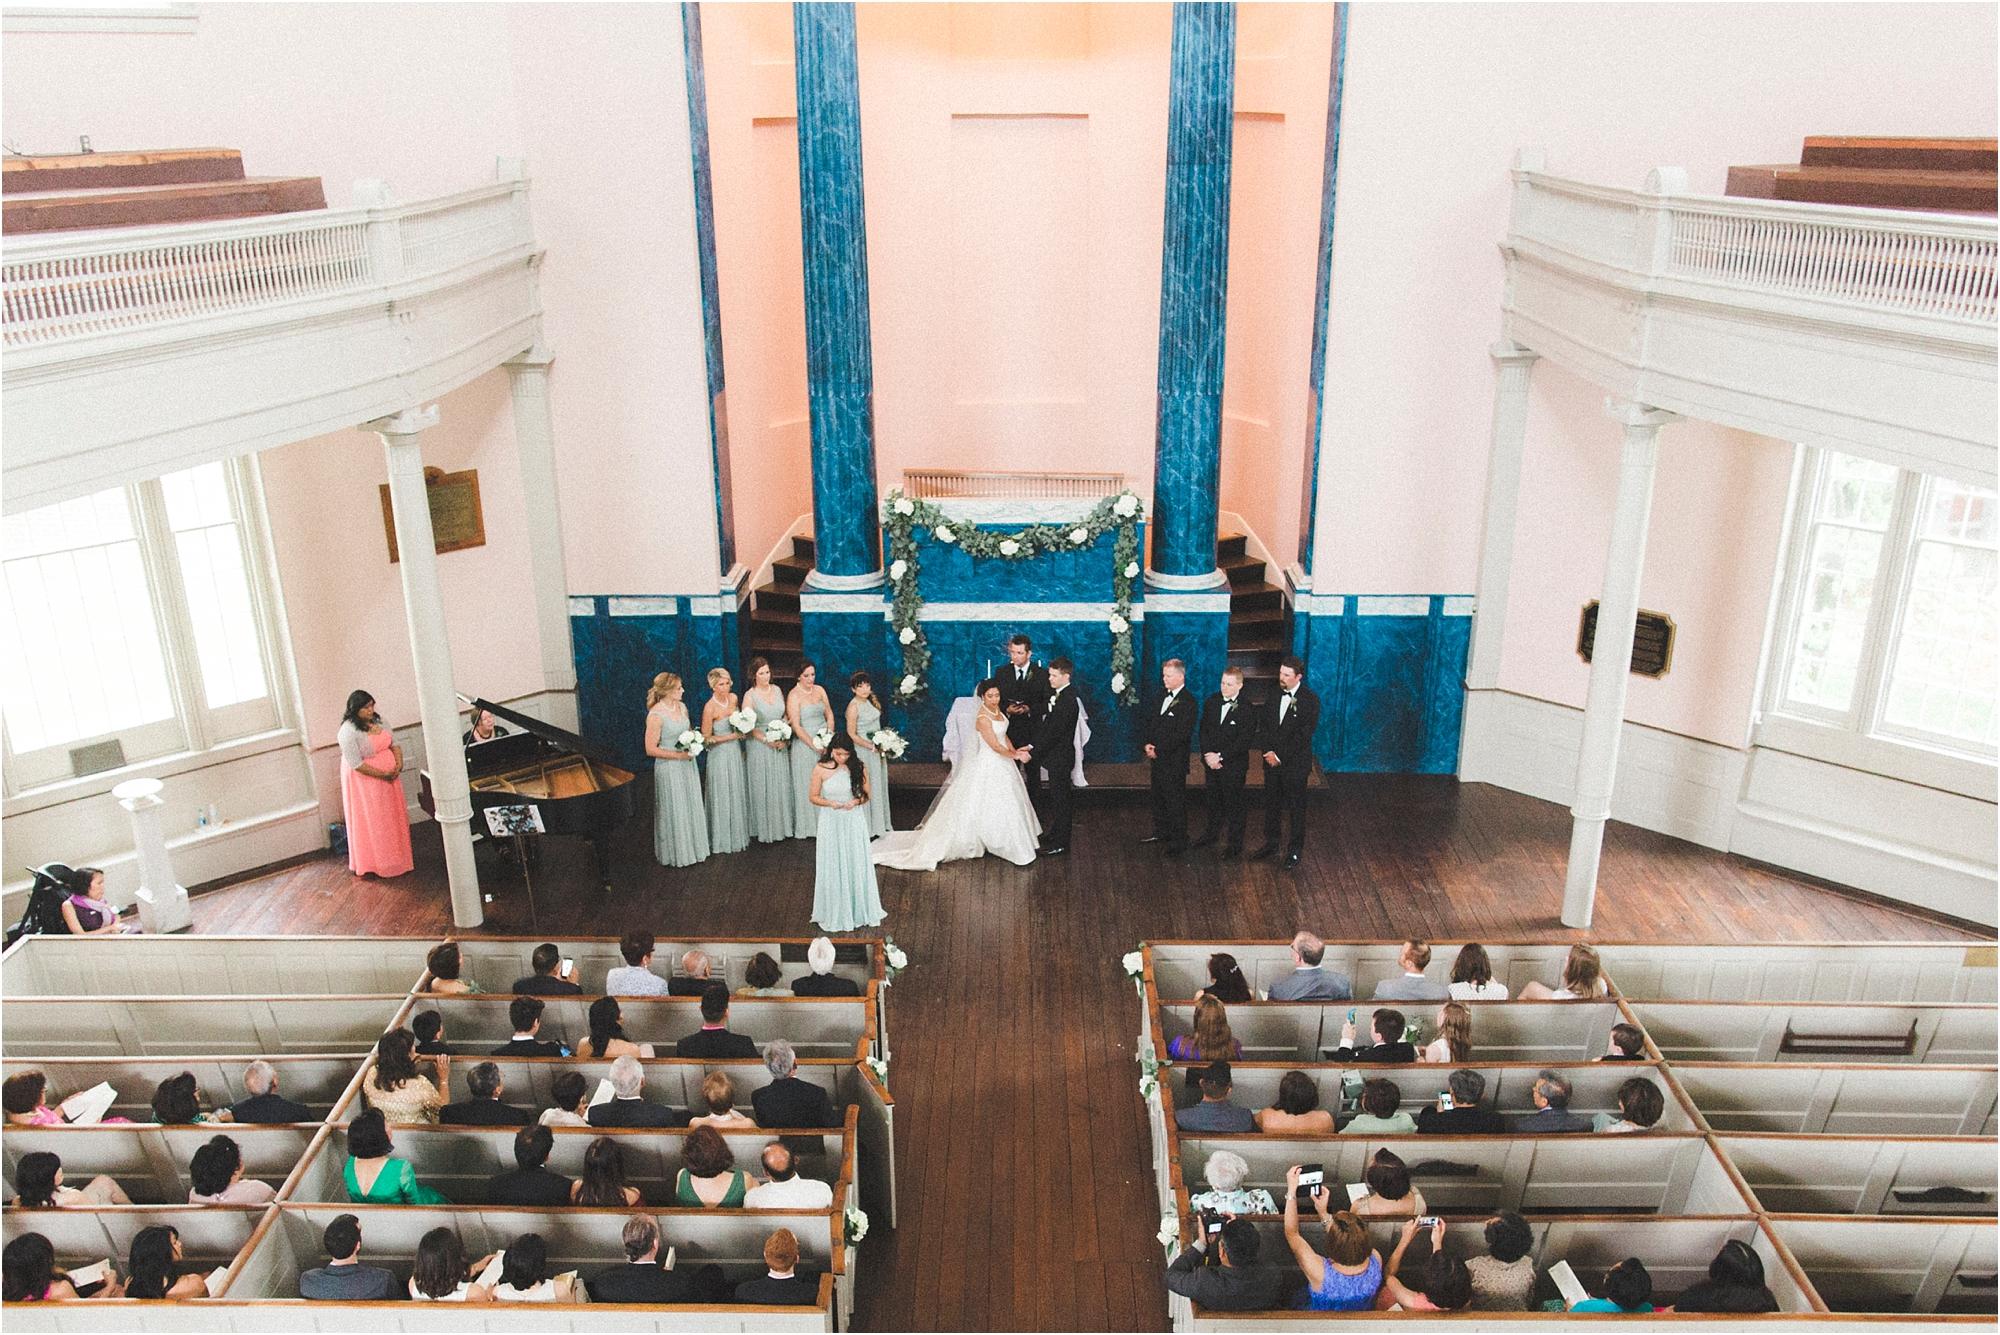 stephanie-yonce-photography-historic-church-virginia-museu-fine-arts-wedding-photos_042.JPG